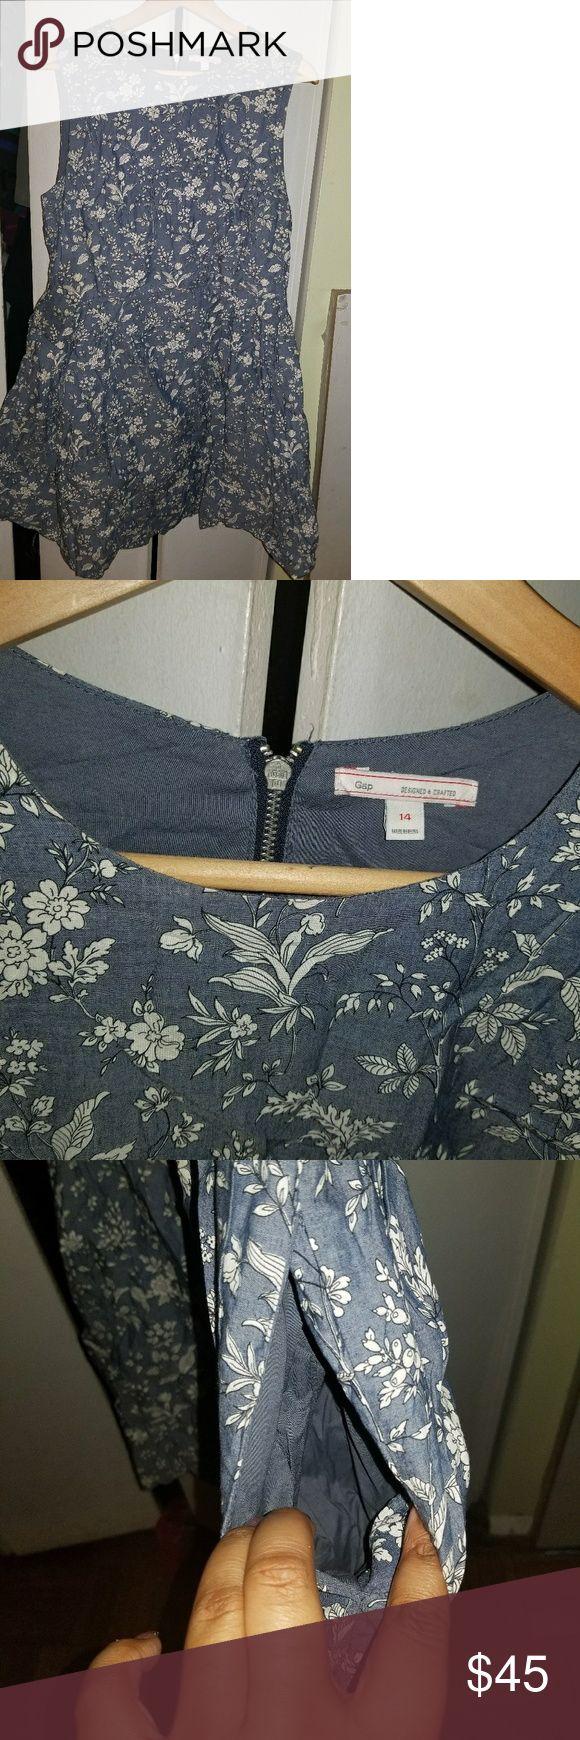 Floral Gap Dress NWOT! Has pockets, back zip, & lining. 100% cotton. Never worn. GAP Dresses